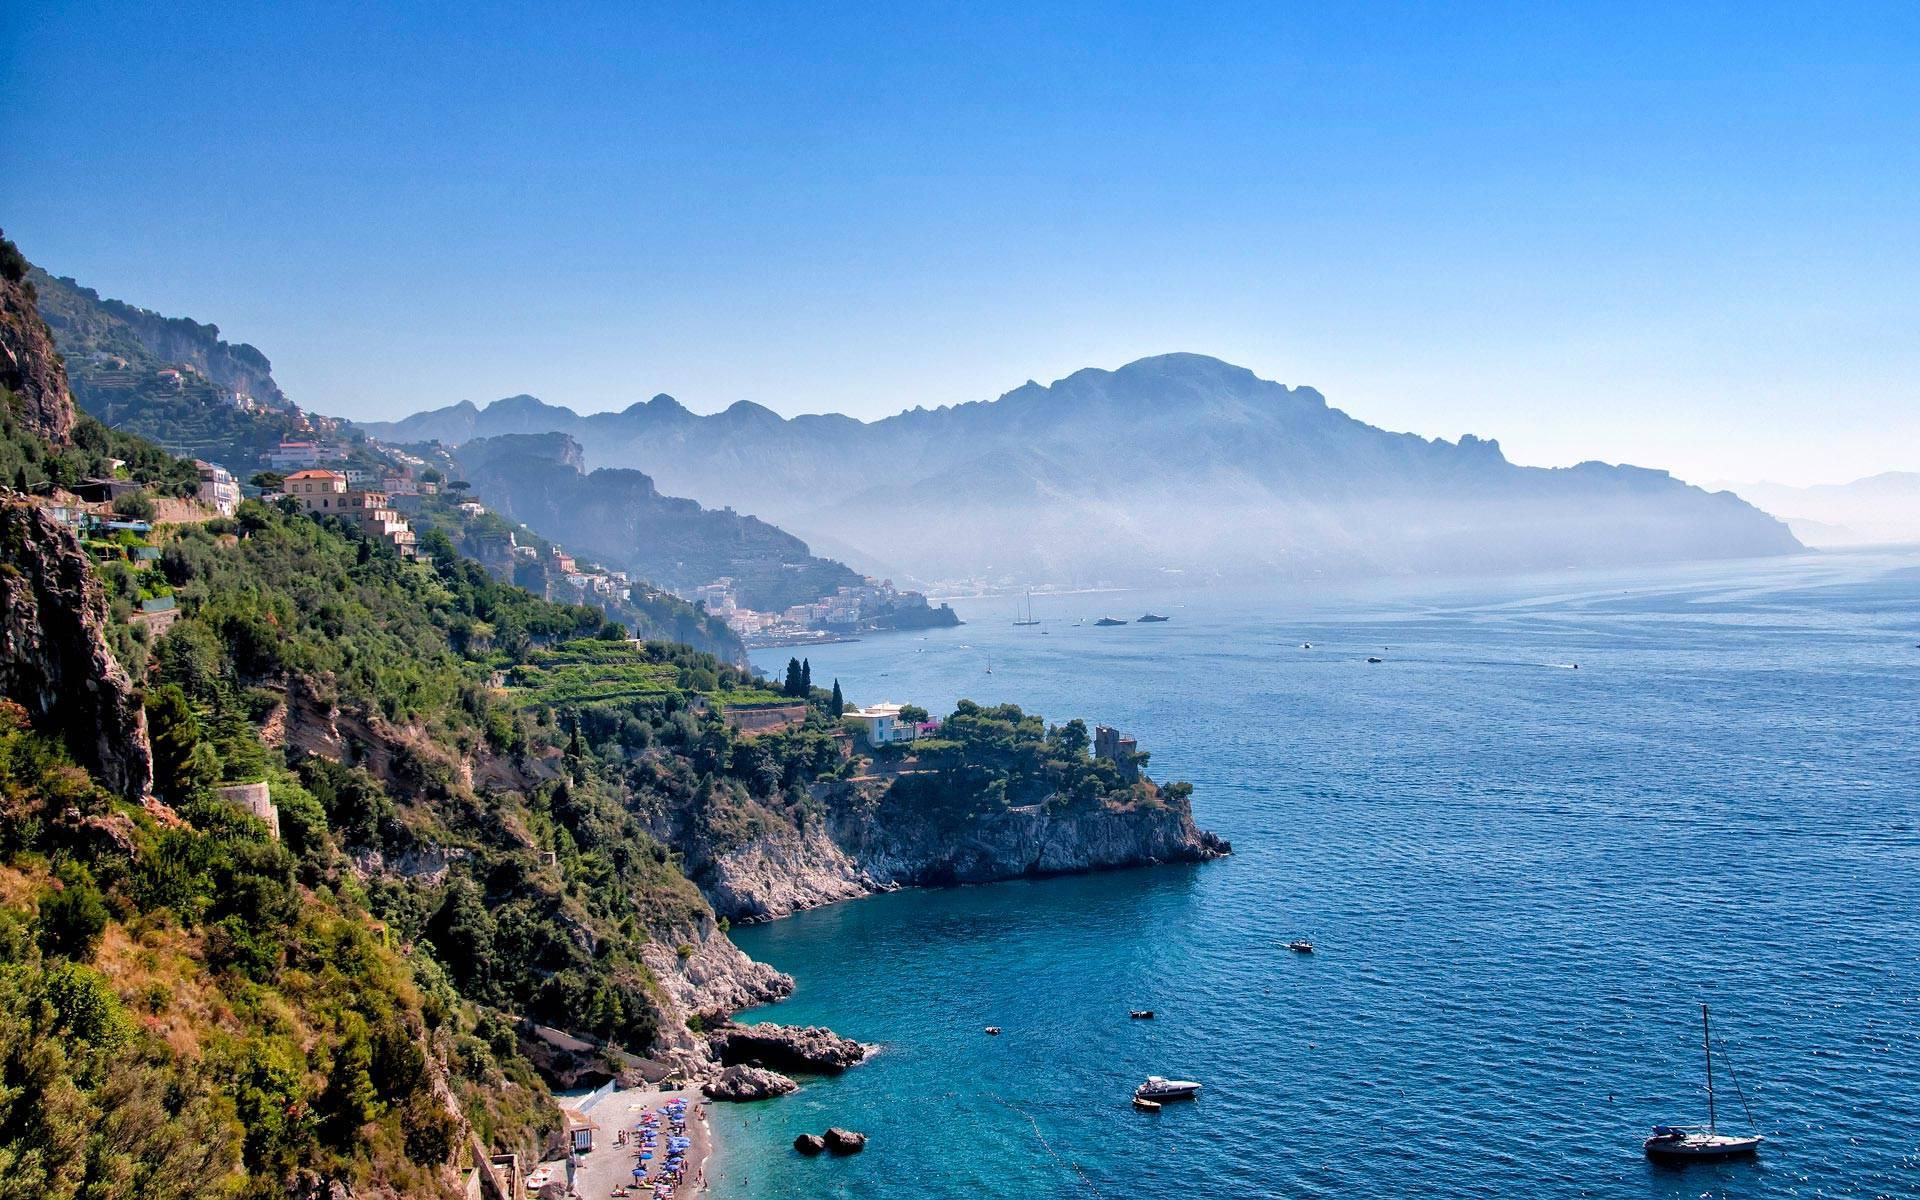 Hike the Amalfi Coast, Italy with Mountain Trek